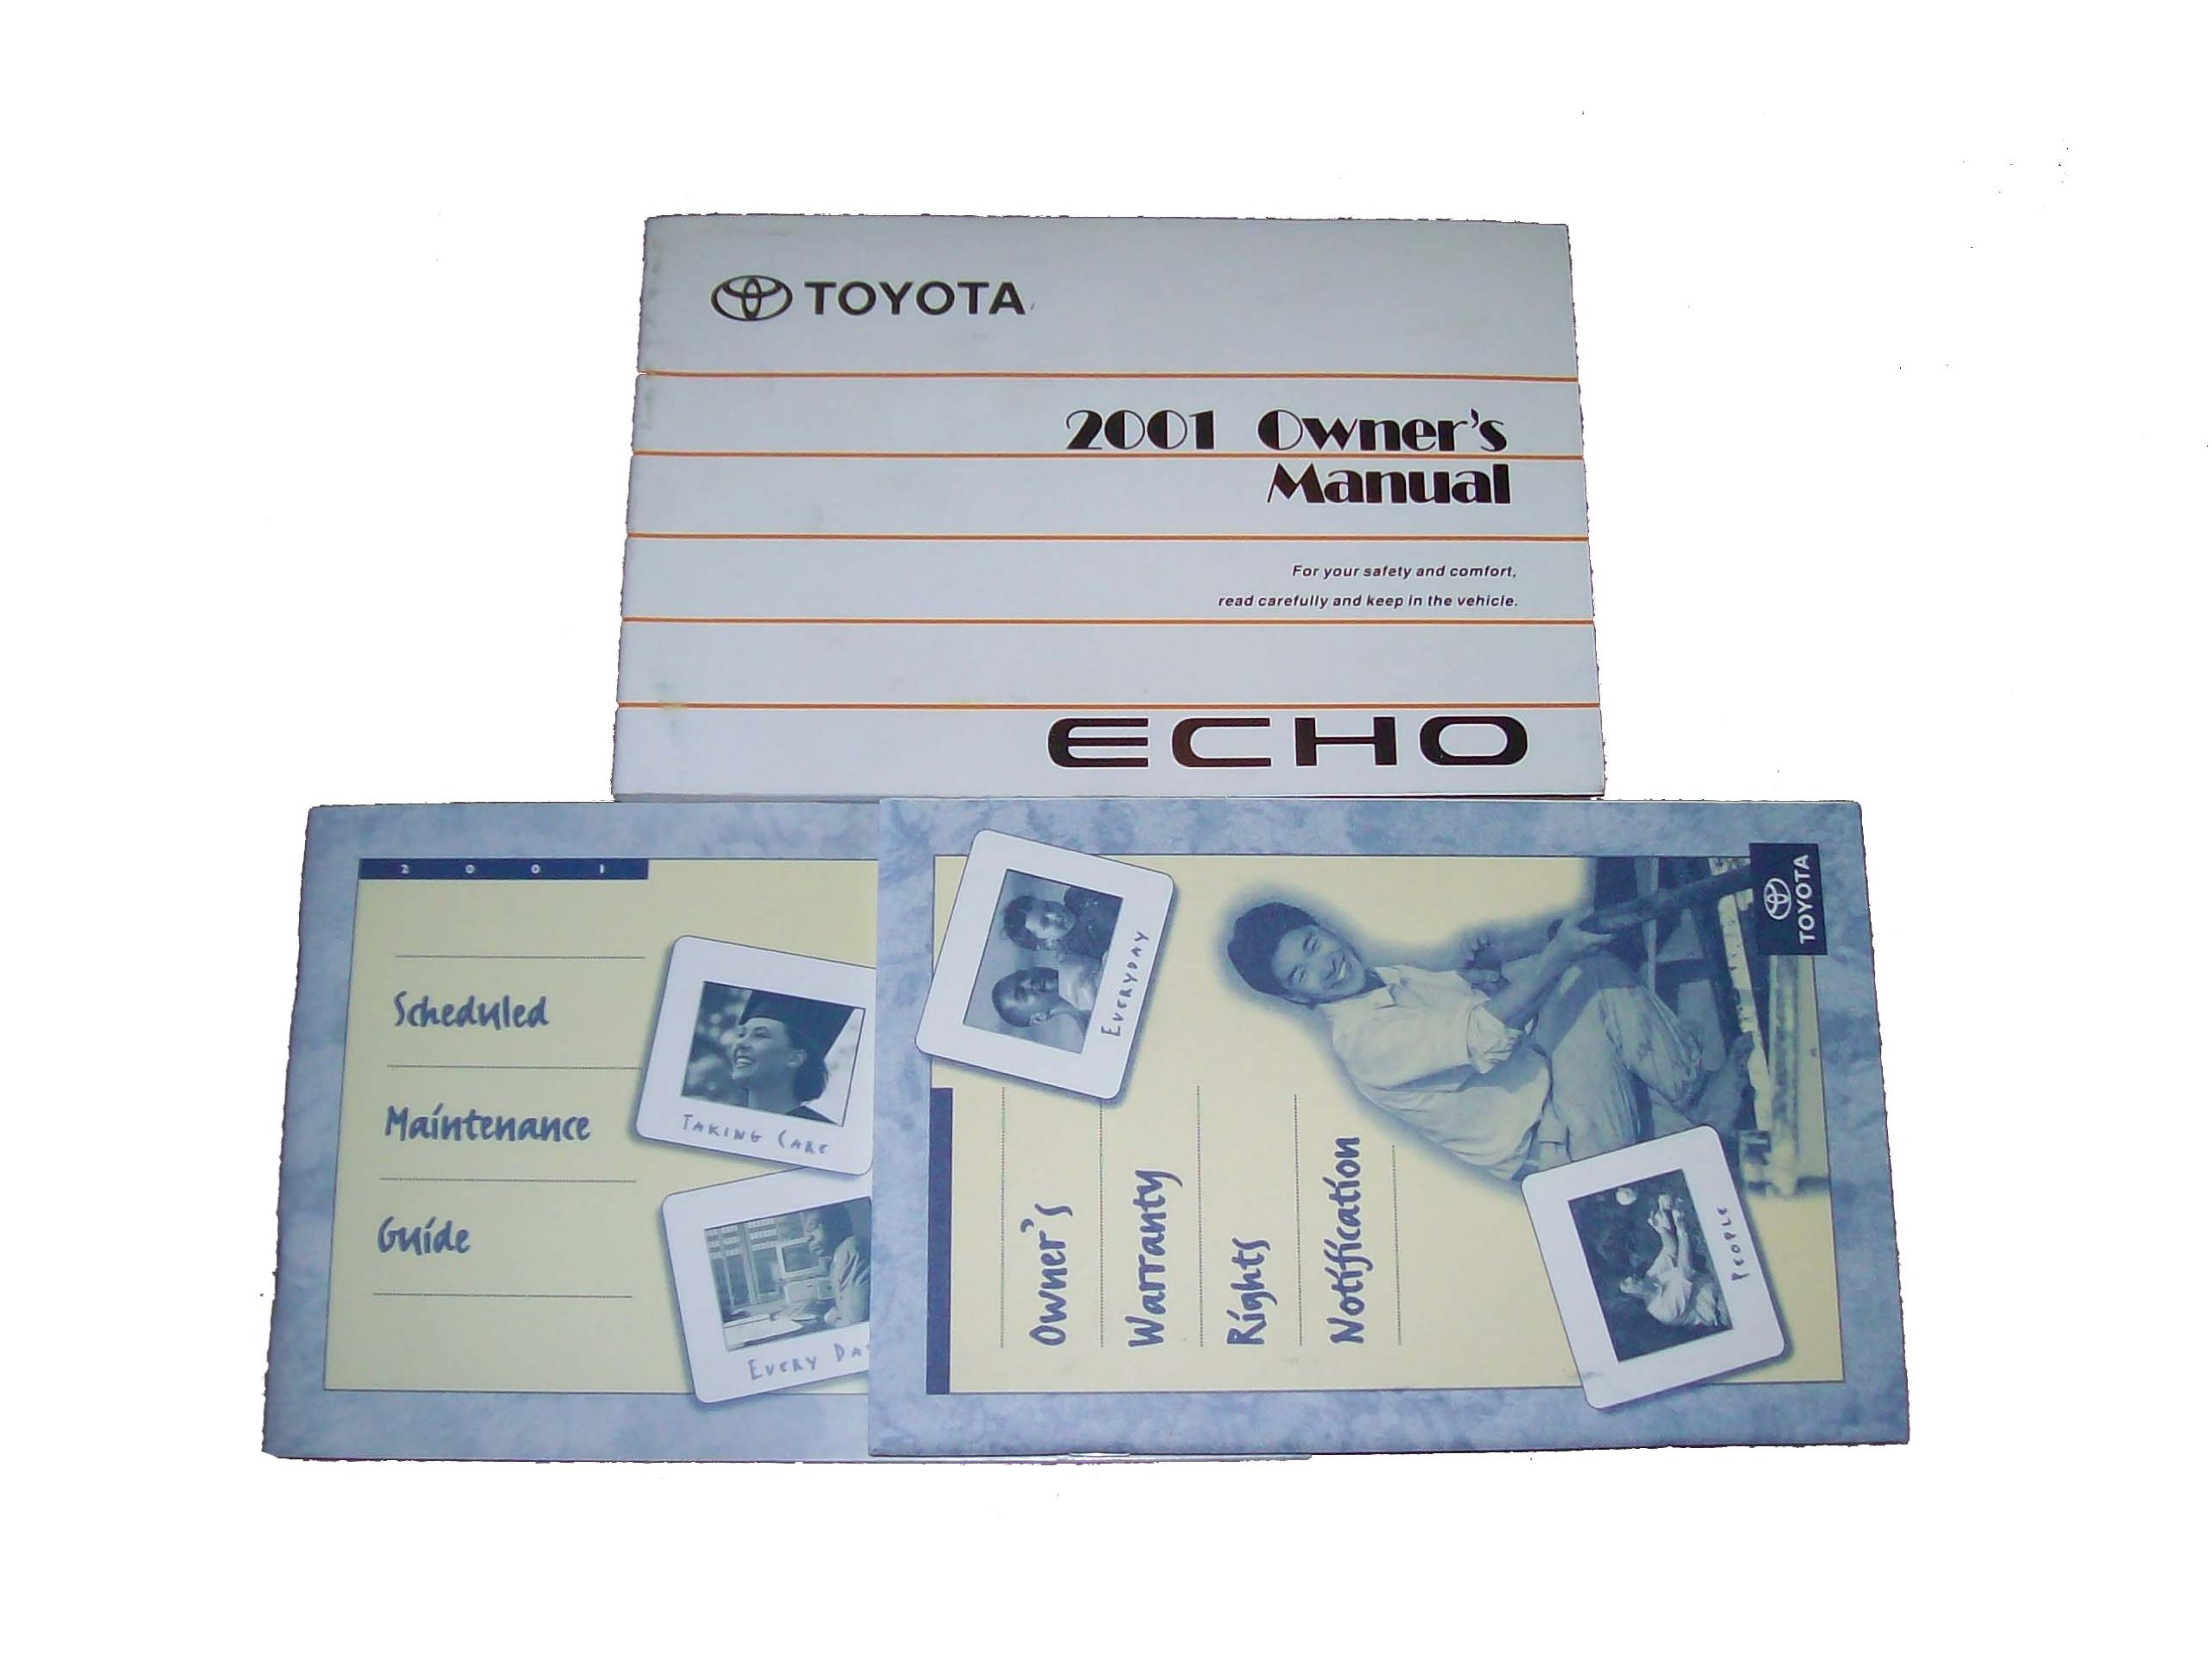 2001 toyota echo owners manual toyota amazon com books rh amazon com Toyota Echo 2001 Carburetor Diagram 2001 toyota echo owners manual australia